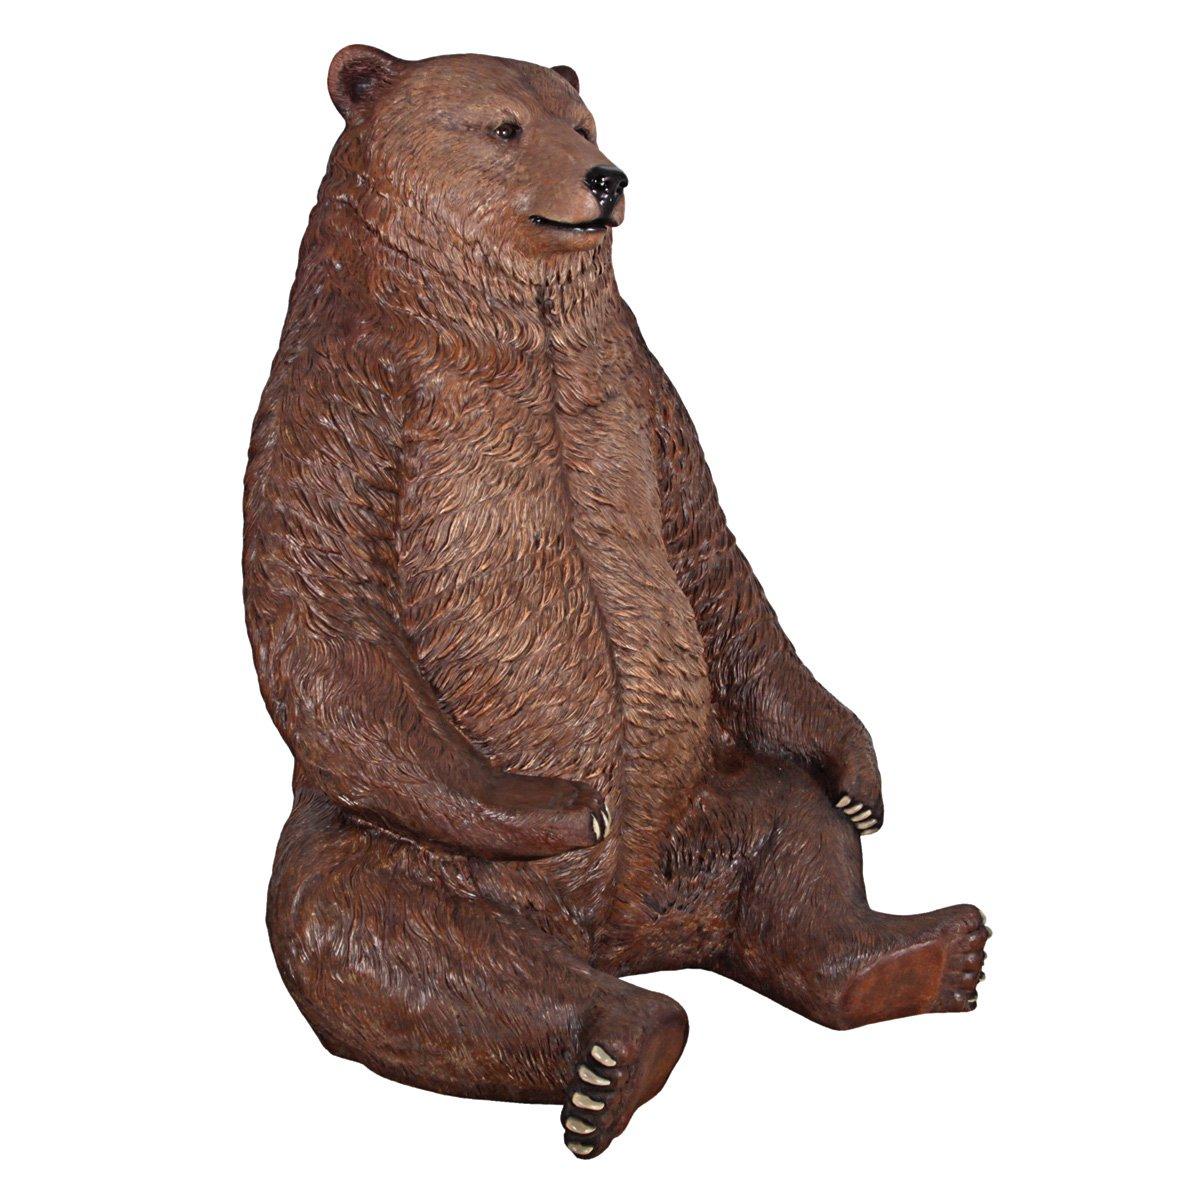 Massive Brown Bear Chair The Green Head : massive brown bear chair 2 from www.thegreenhead.com size 1200 x 1200 jpeg 294kB